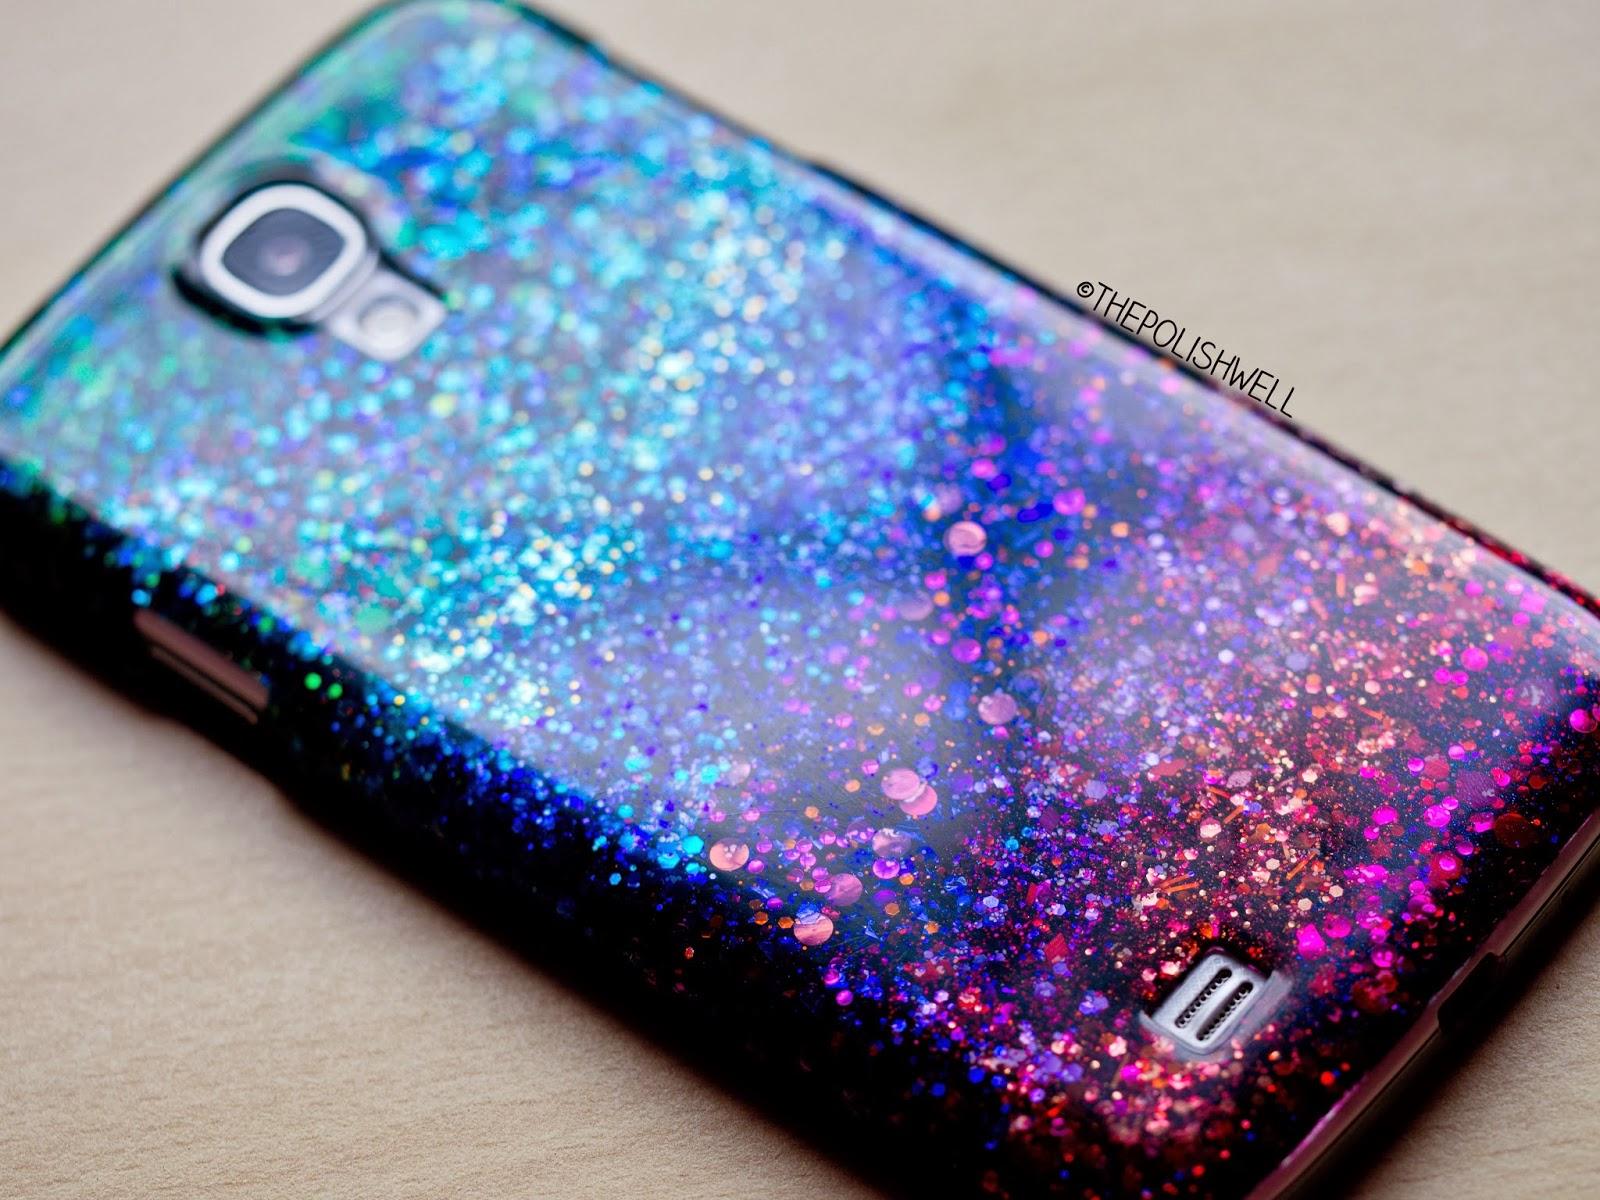 Diy Phone Case Ideas With Nail Polish 68809 Loadtve